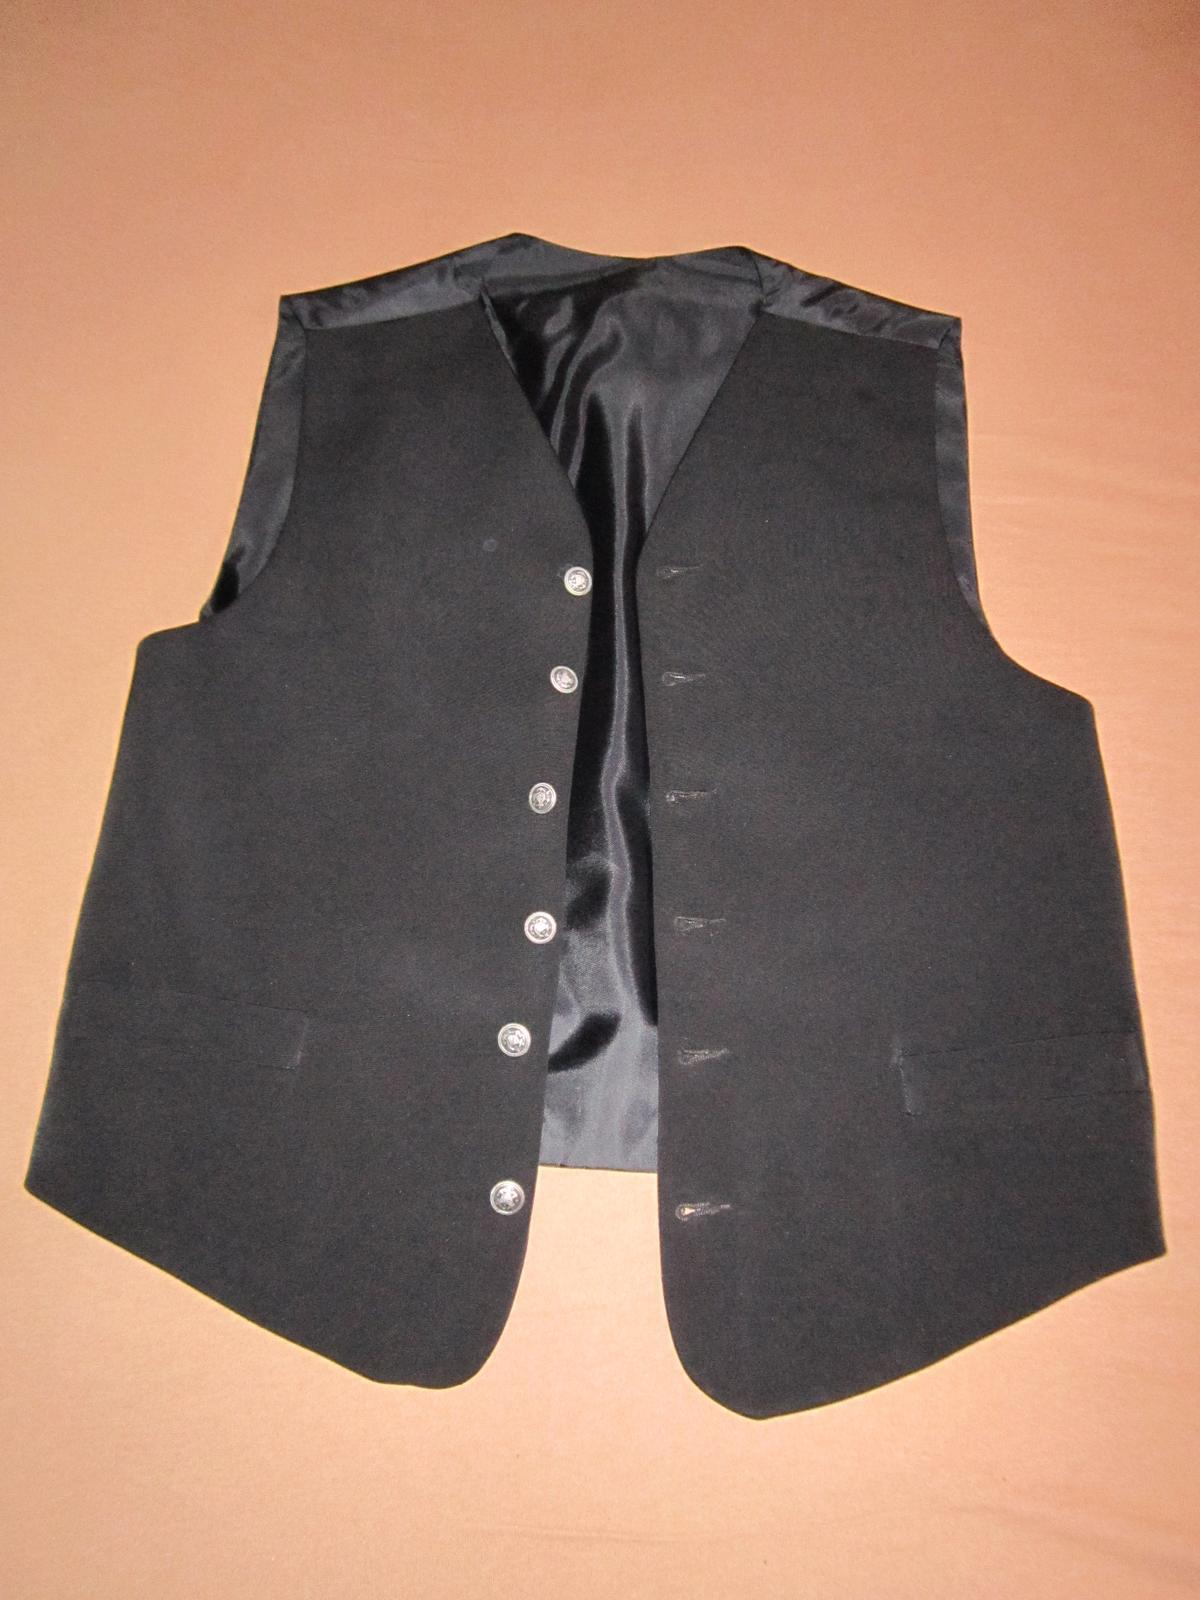 1569. Elegantný oblek - Obrázok č. 3